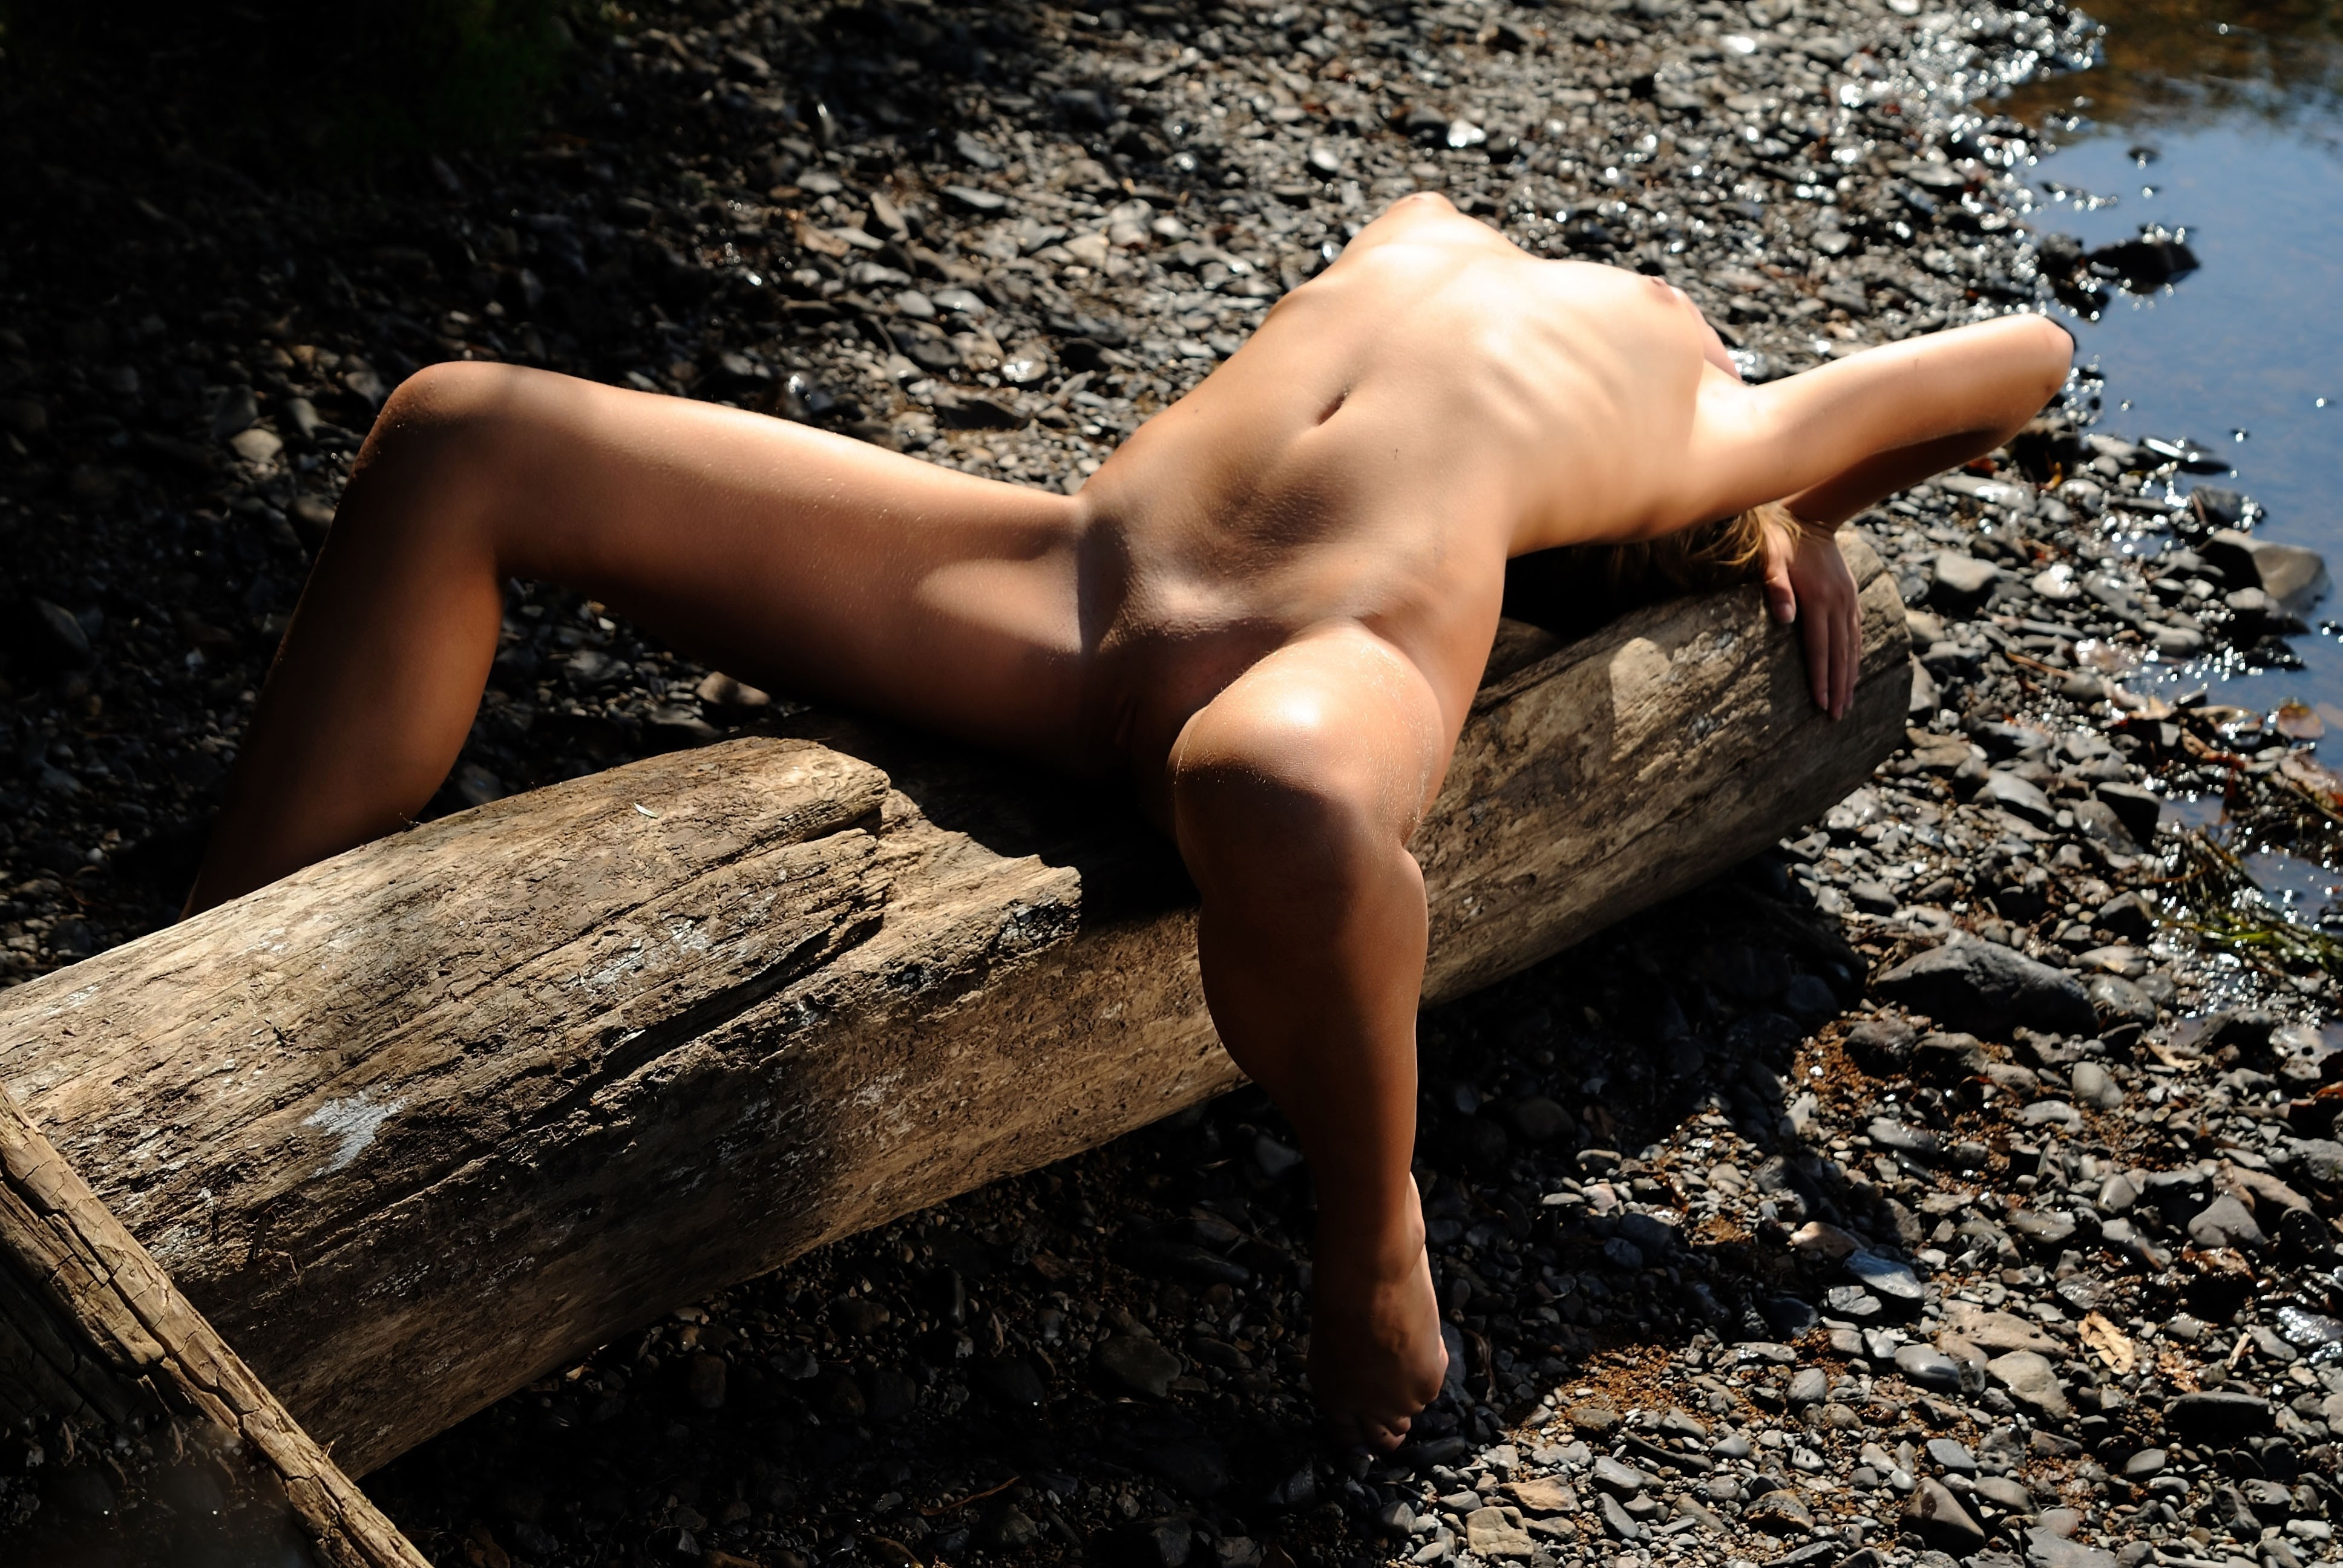 Фото голая девушка на бревнах 18 фотография